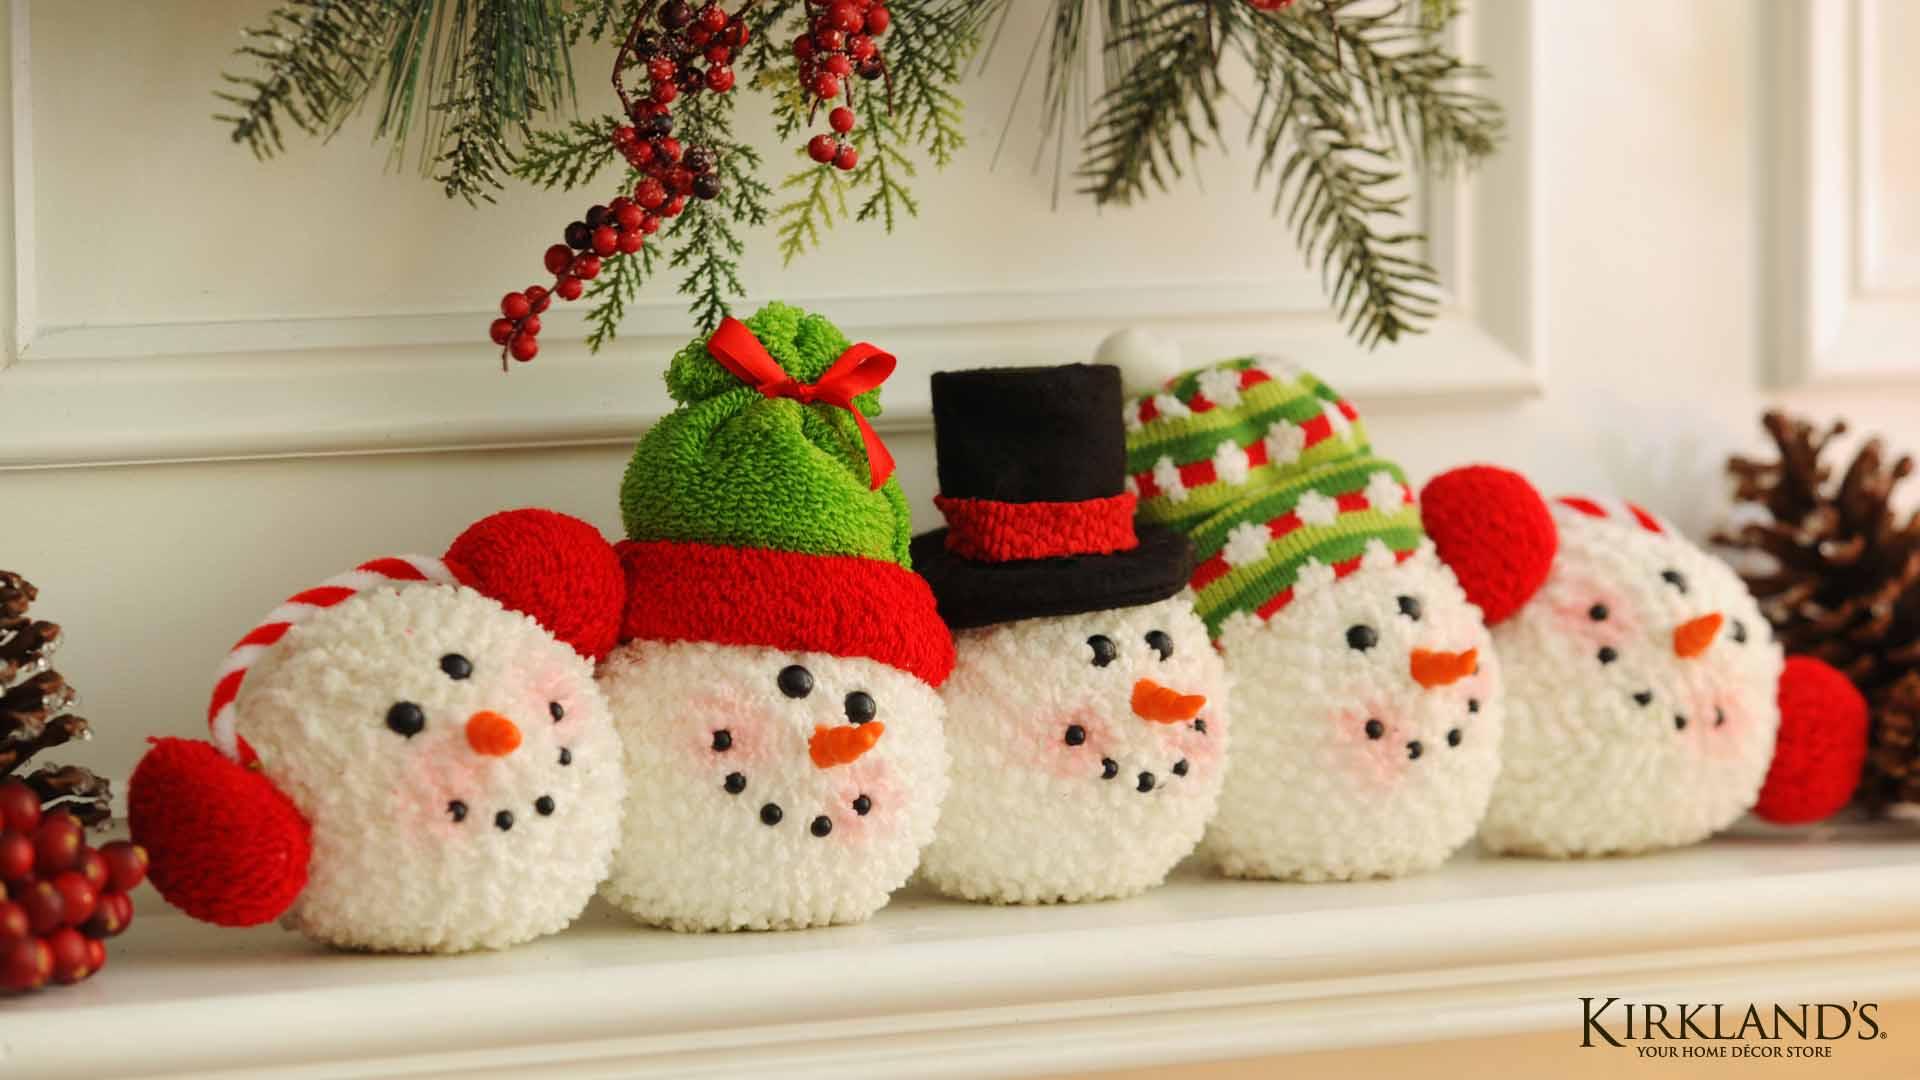 Holidays Christmas Seasonal Festive Hd Wallpaper 1467018: Holiday Wallpaper (35 Wallpapers)